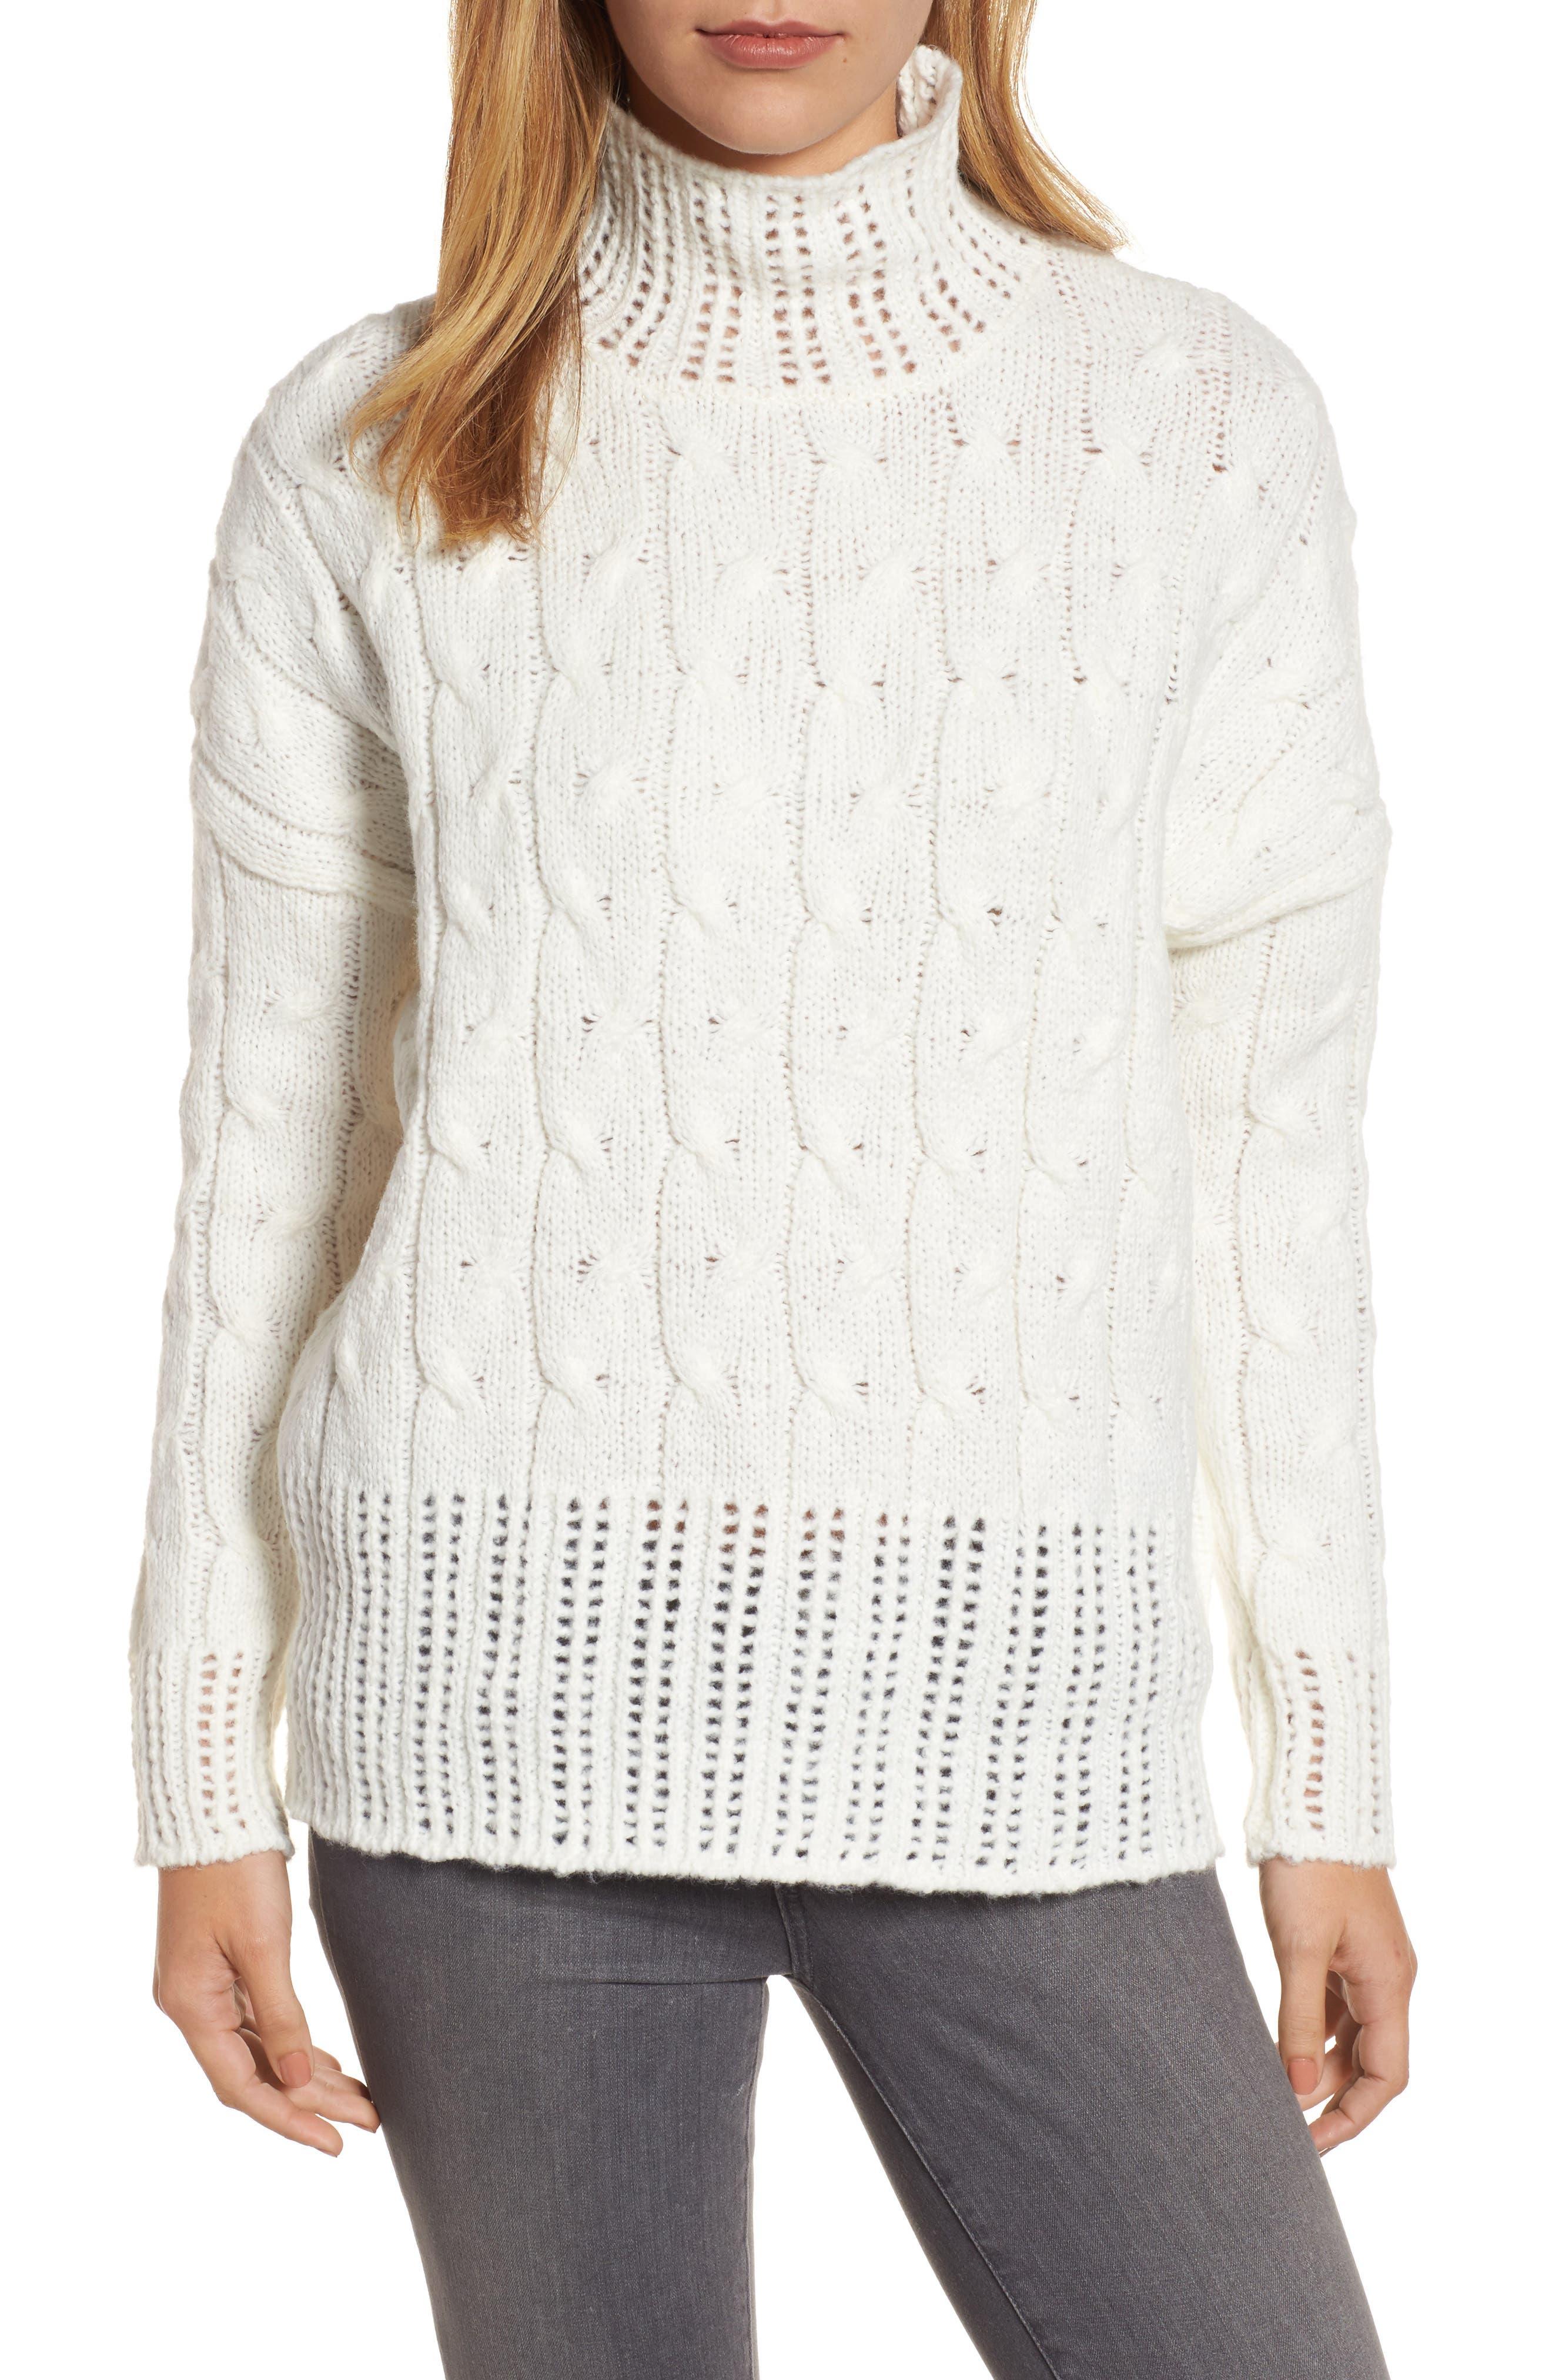 Alternate Image 1 Selected - Press Pointelle Turtleneck Sweater